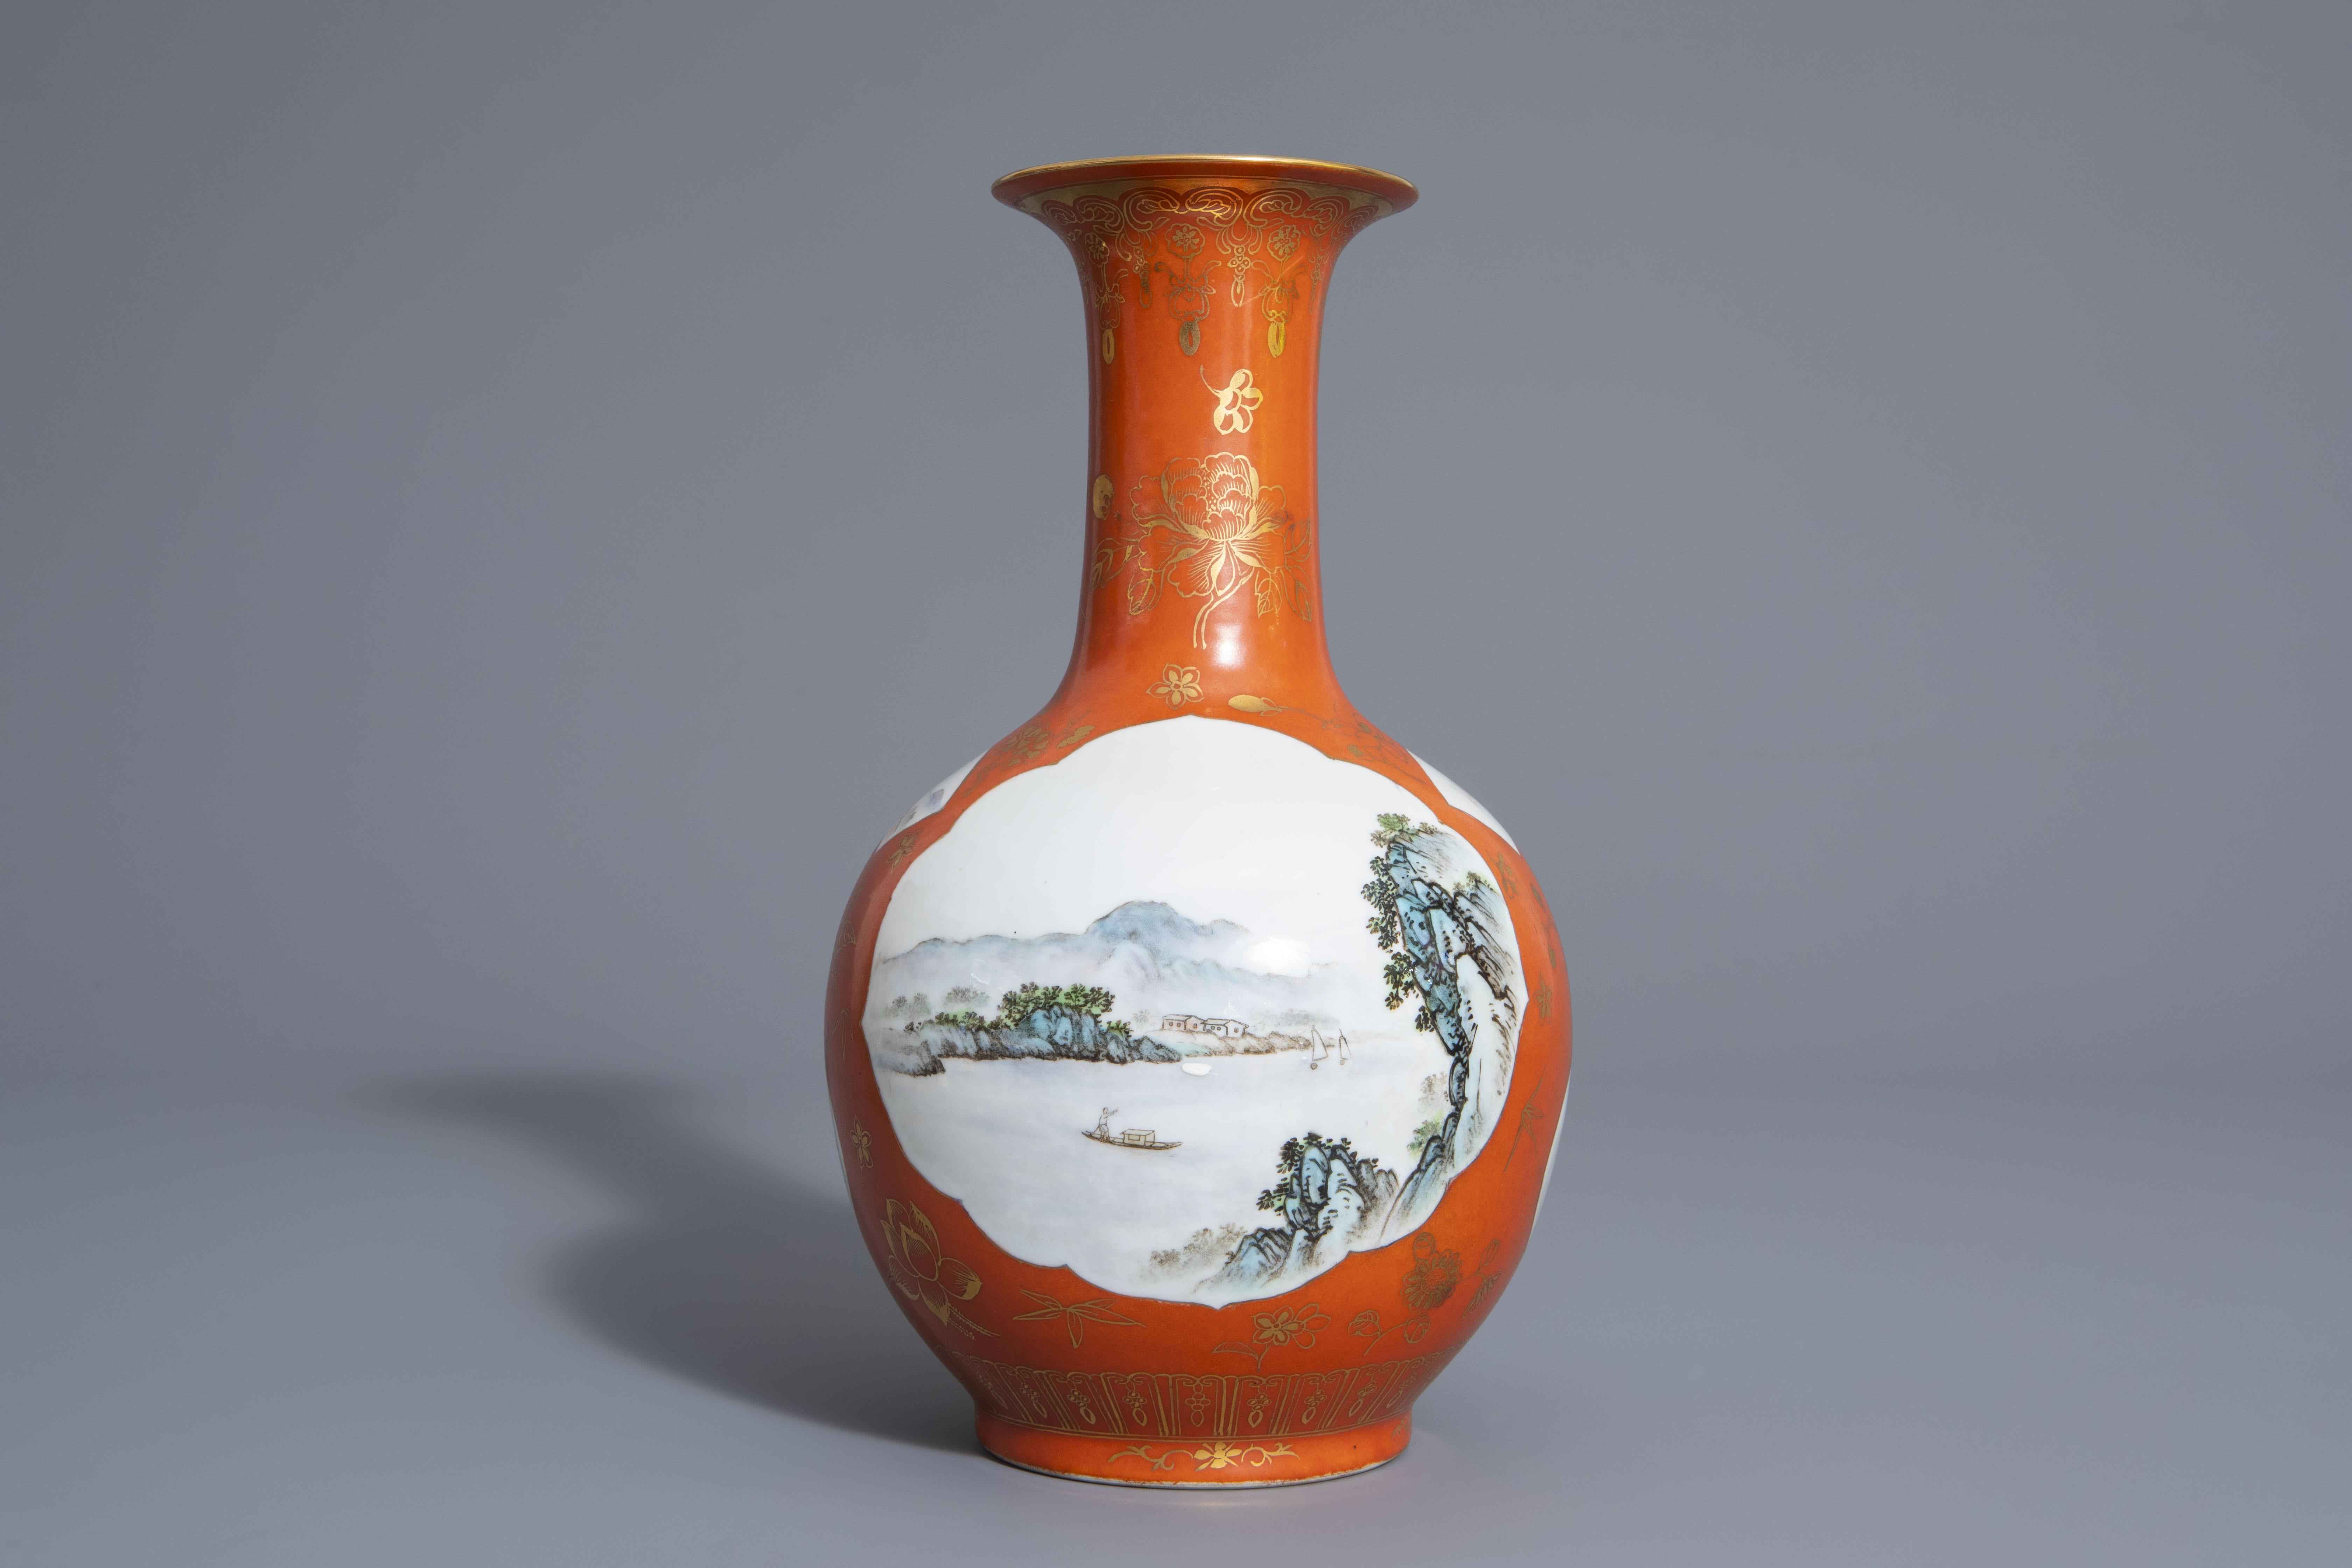 A Chinese bottle shaped orange ground vase with landscapes, Qianlong mark, 20th C. - Image 4 of 7